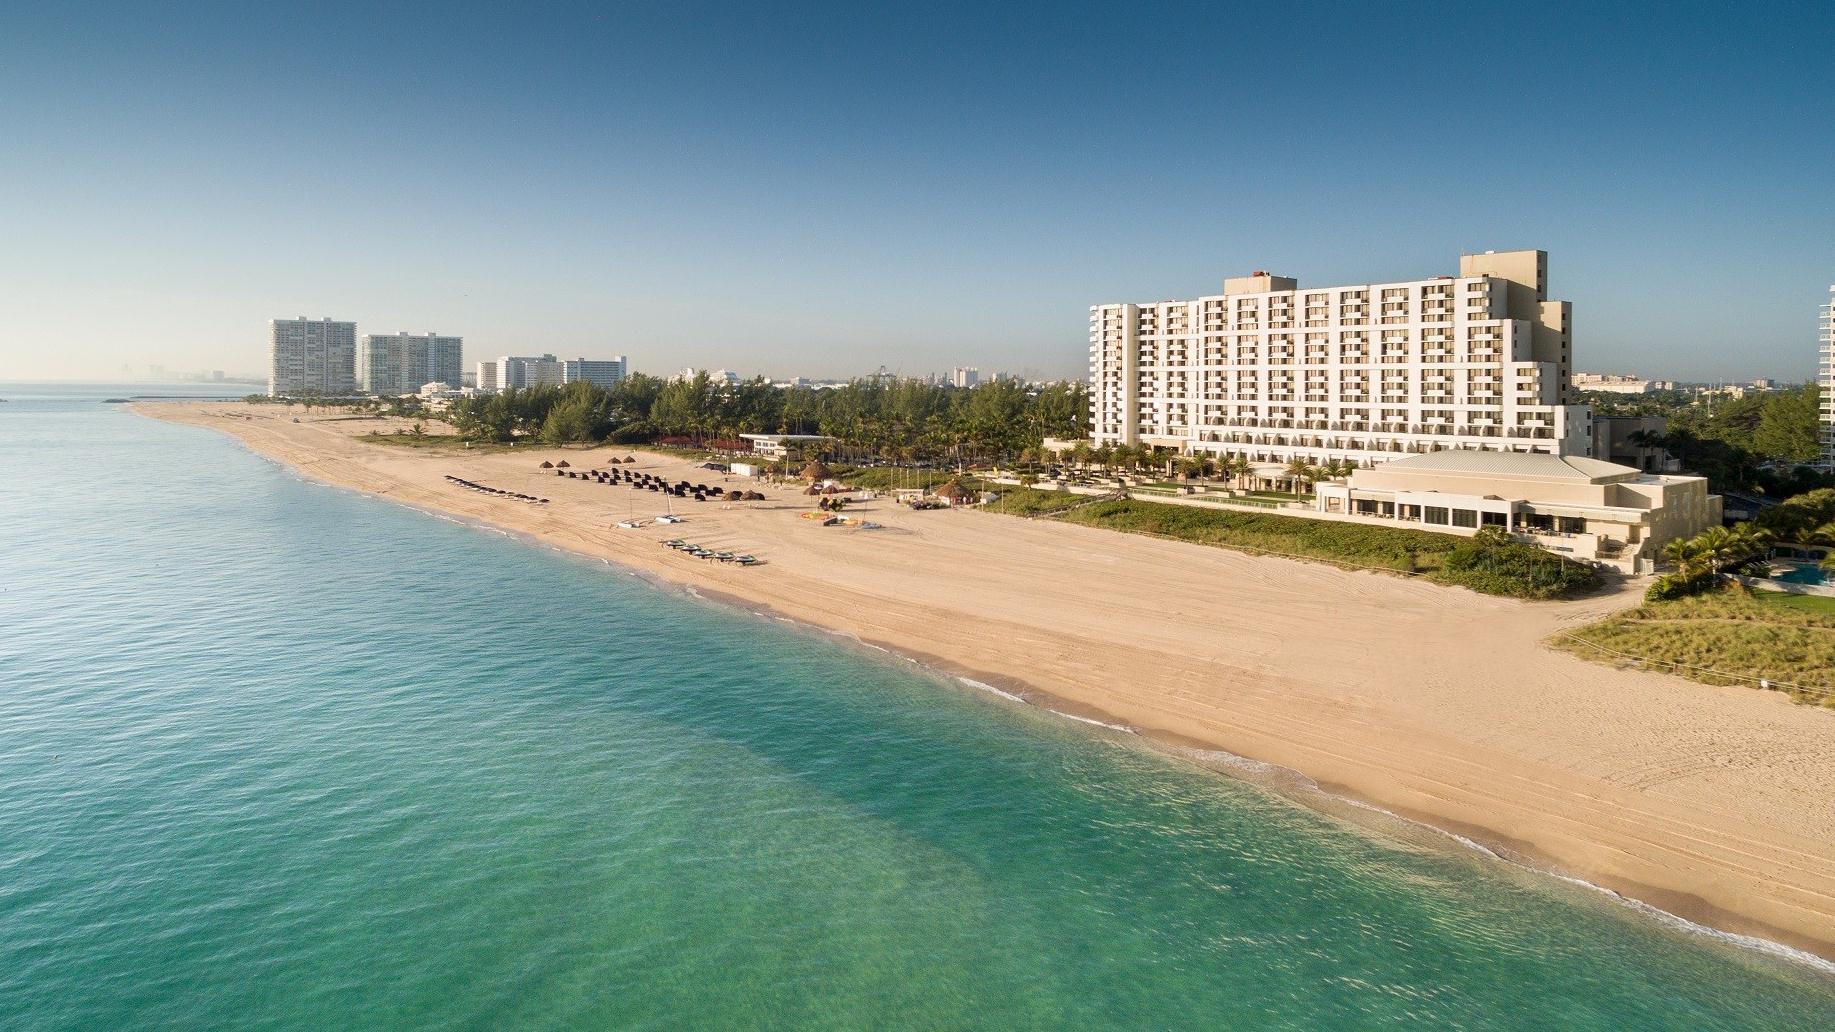 Meetings and events at Fort Lauderdale Marriott Harbor Beach Resort